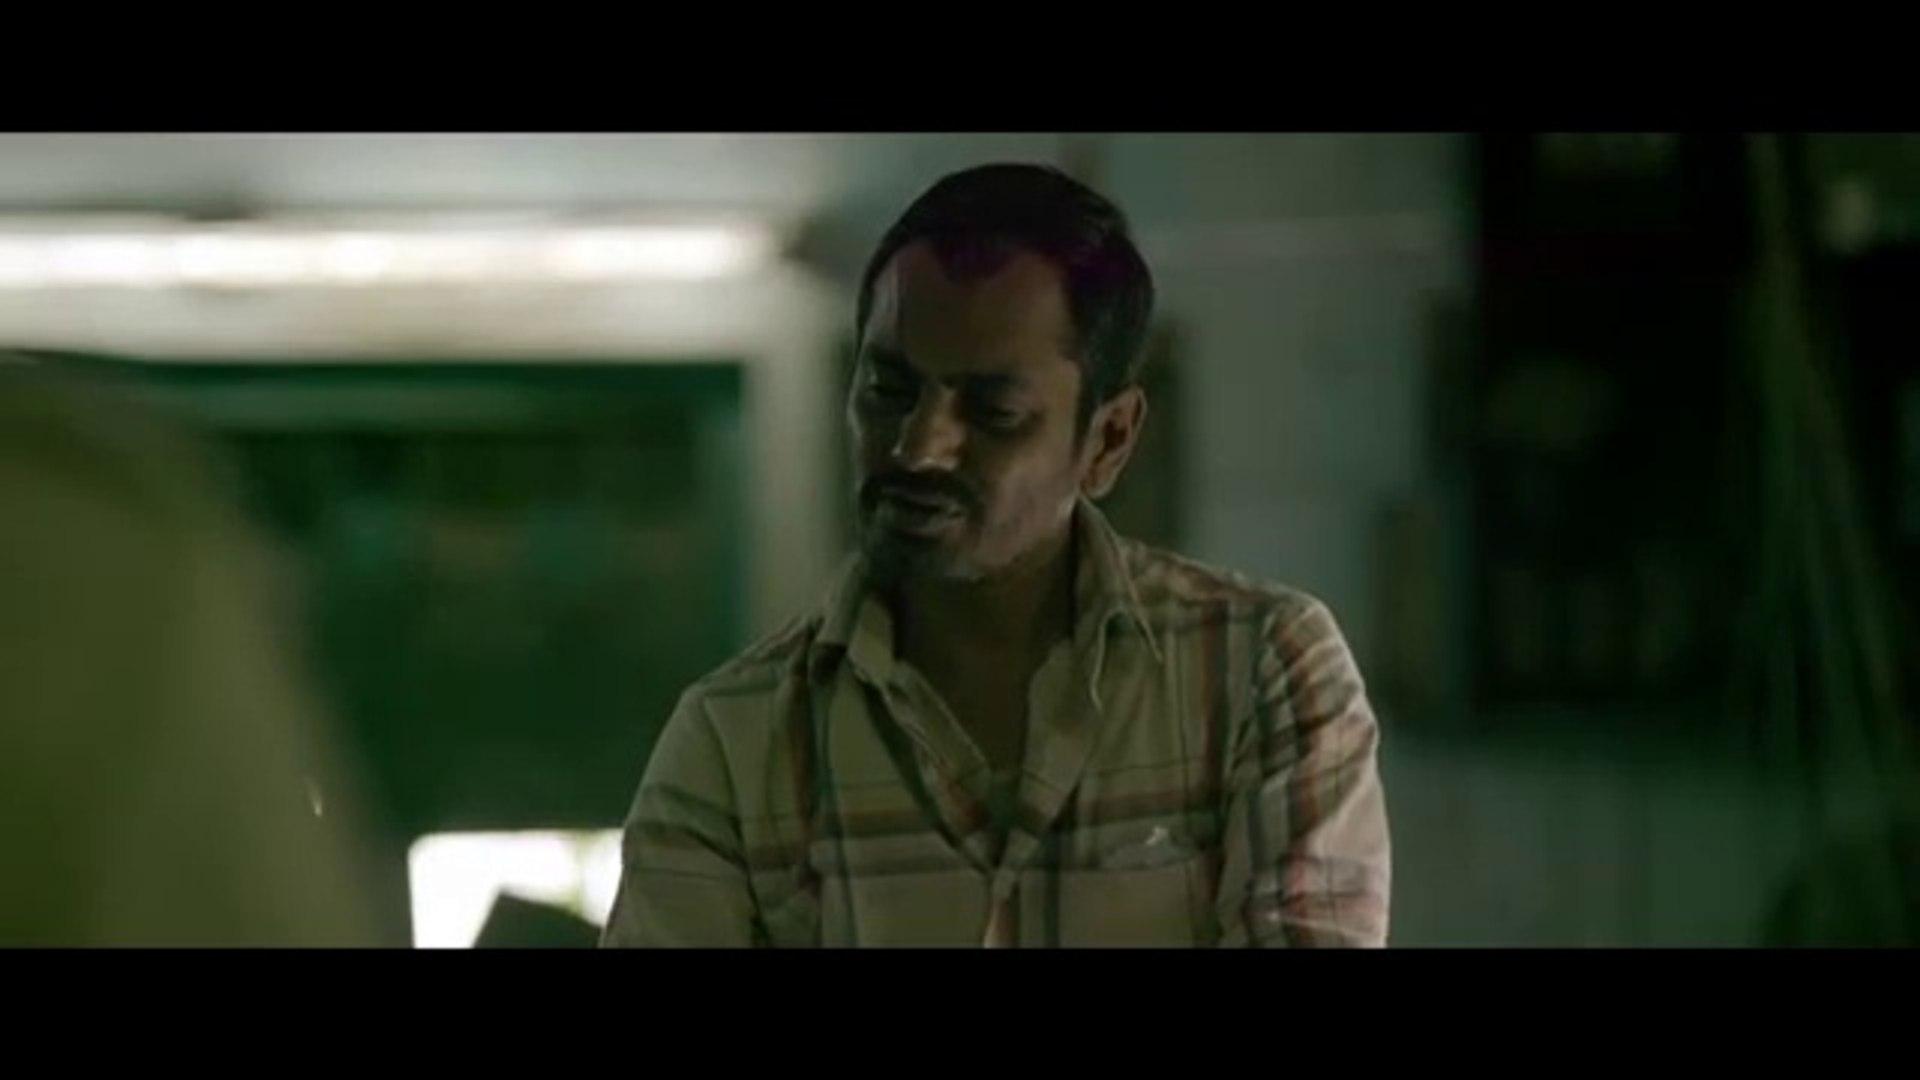 Raman Raghav 2.0  Official Trailer  Nawazuddin Siddiqui  Vicky Kaushal  Releasing 24th June 2016